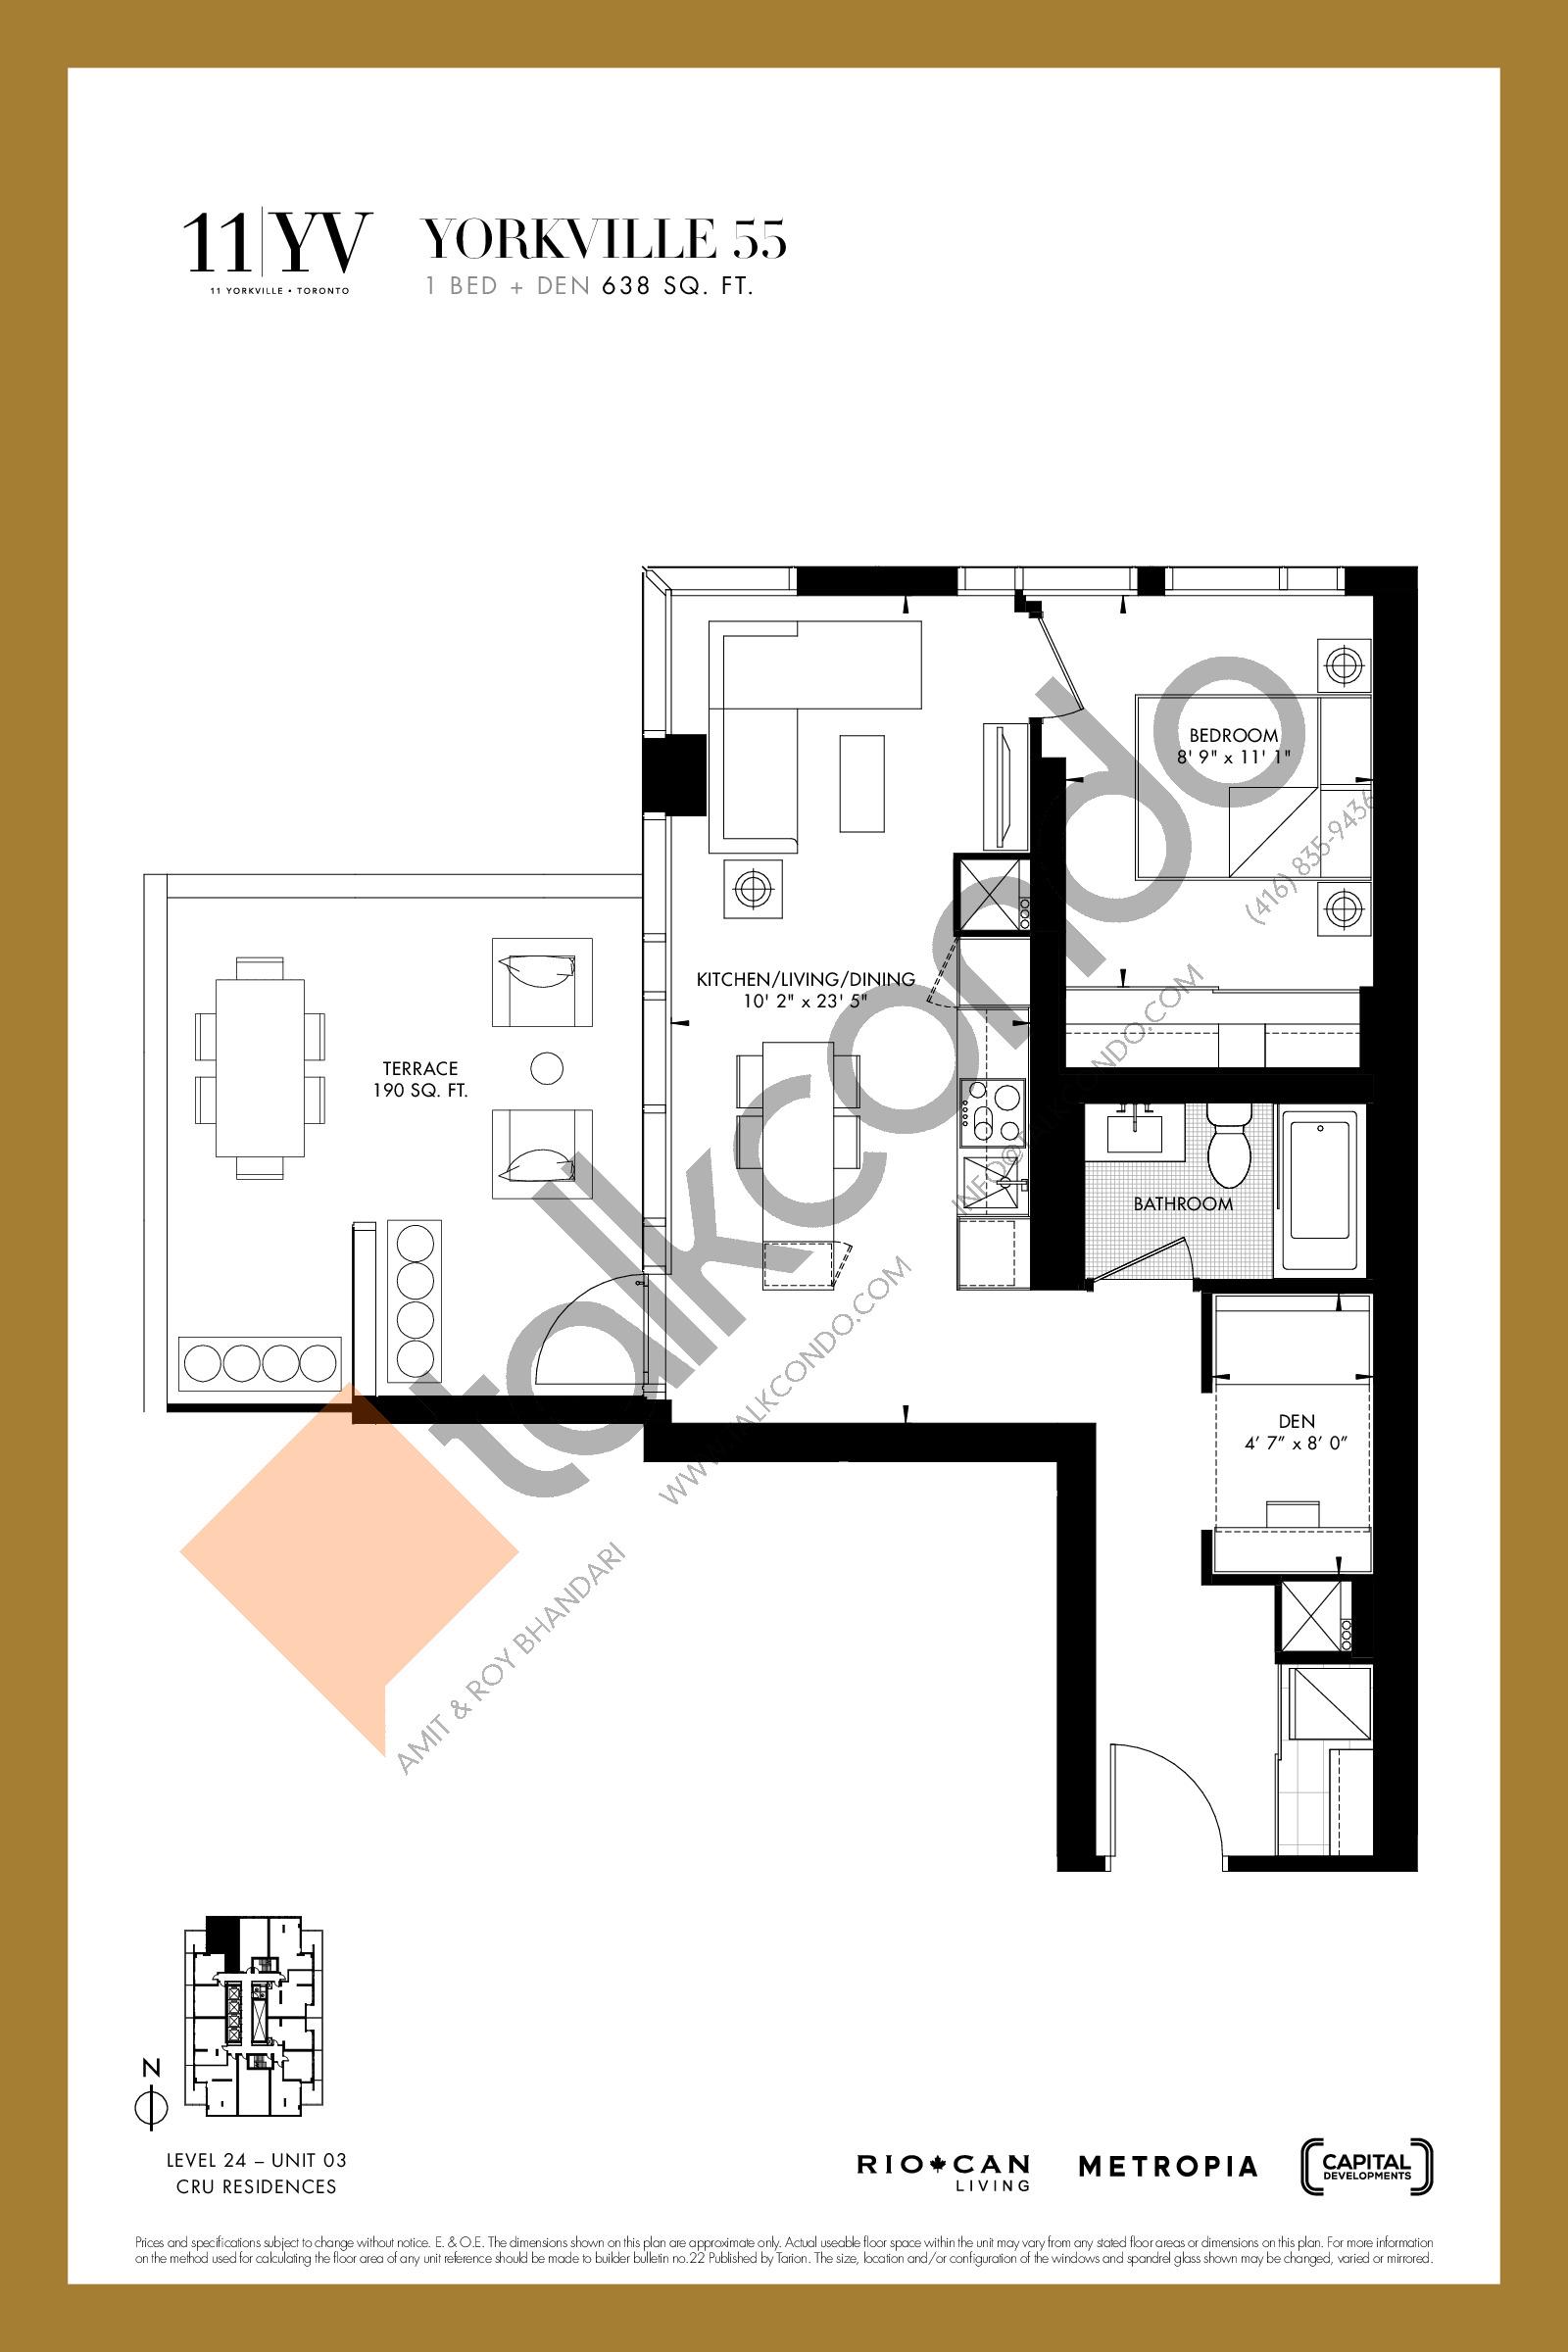 Yorkville 55 Floor Plan at 11YV Condos - 638 sq.ft